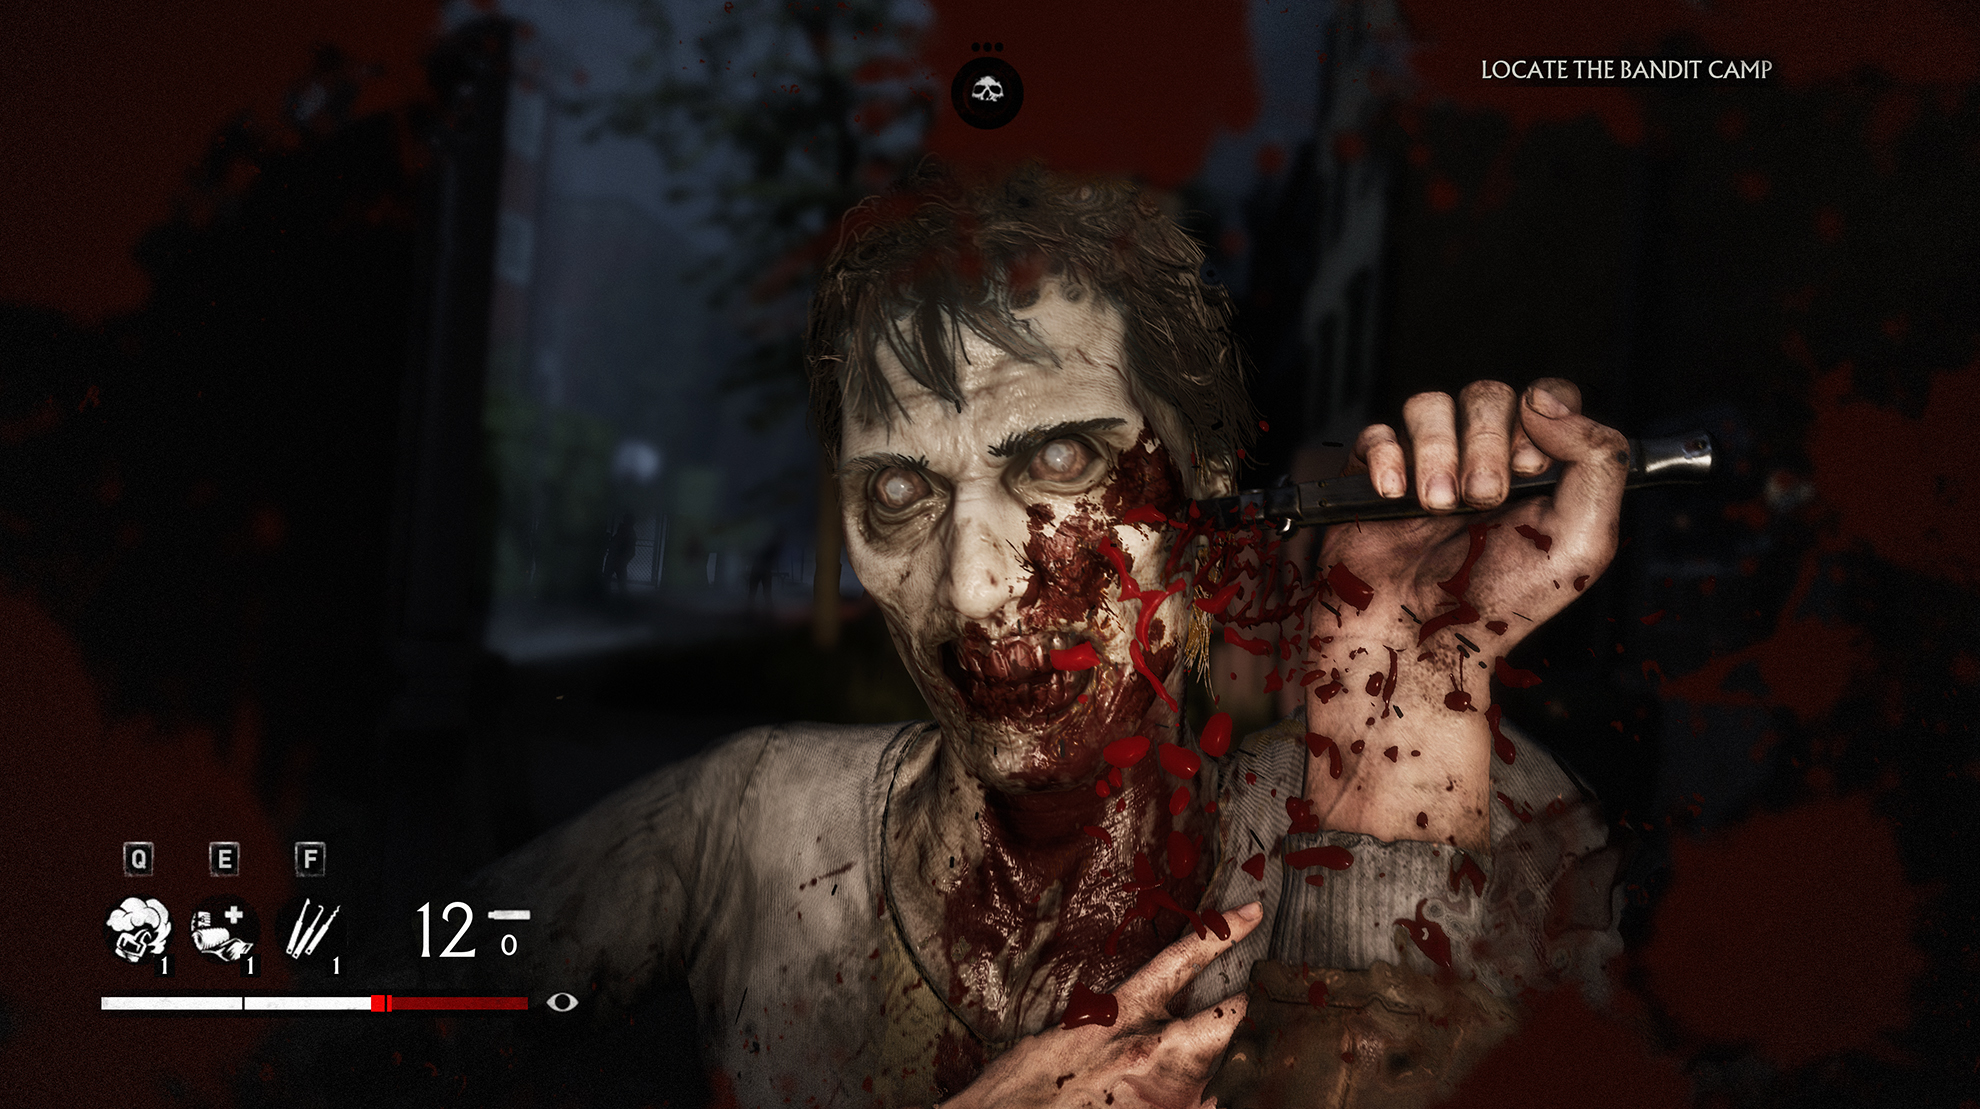 Rockstar buys $7.9 million studio from struggling Starbreeze | PC Gamer